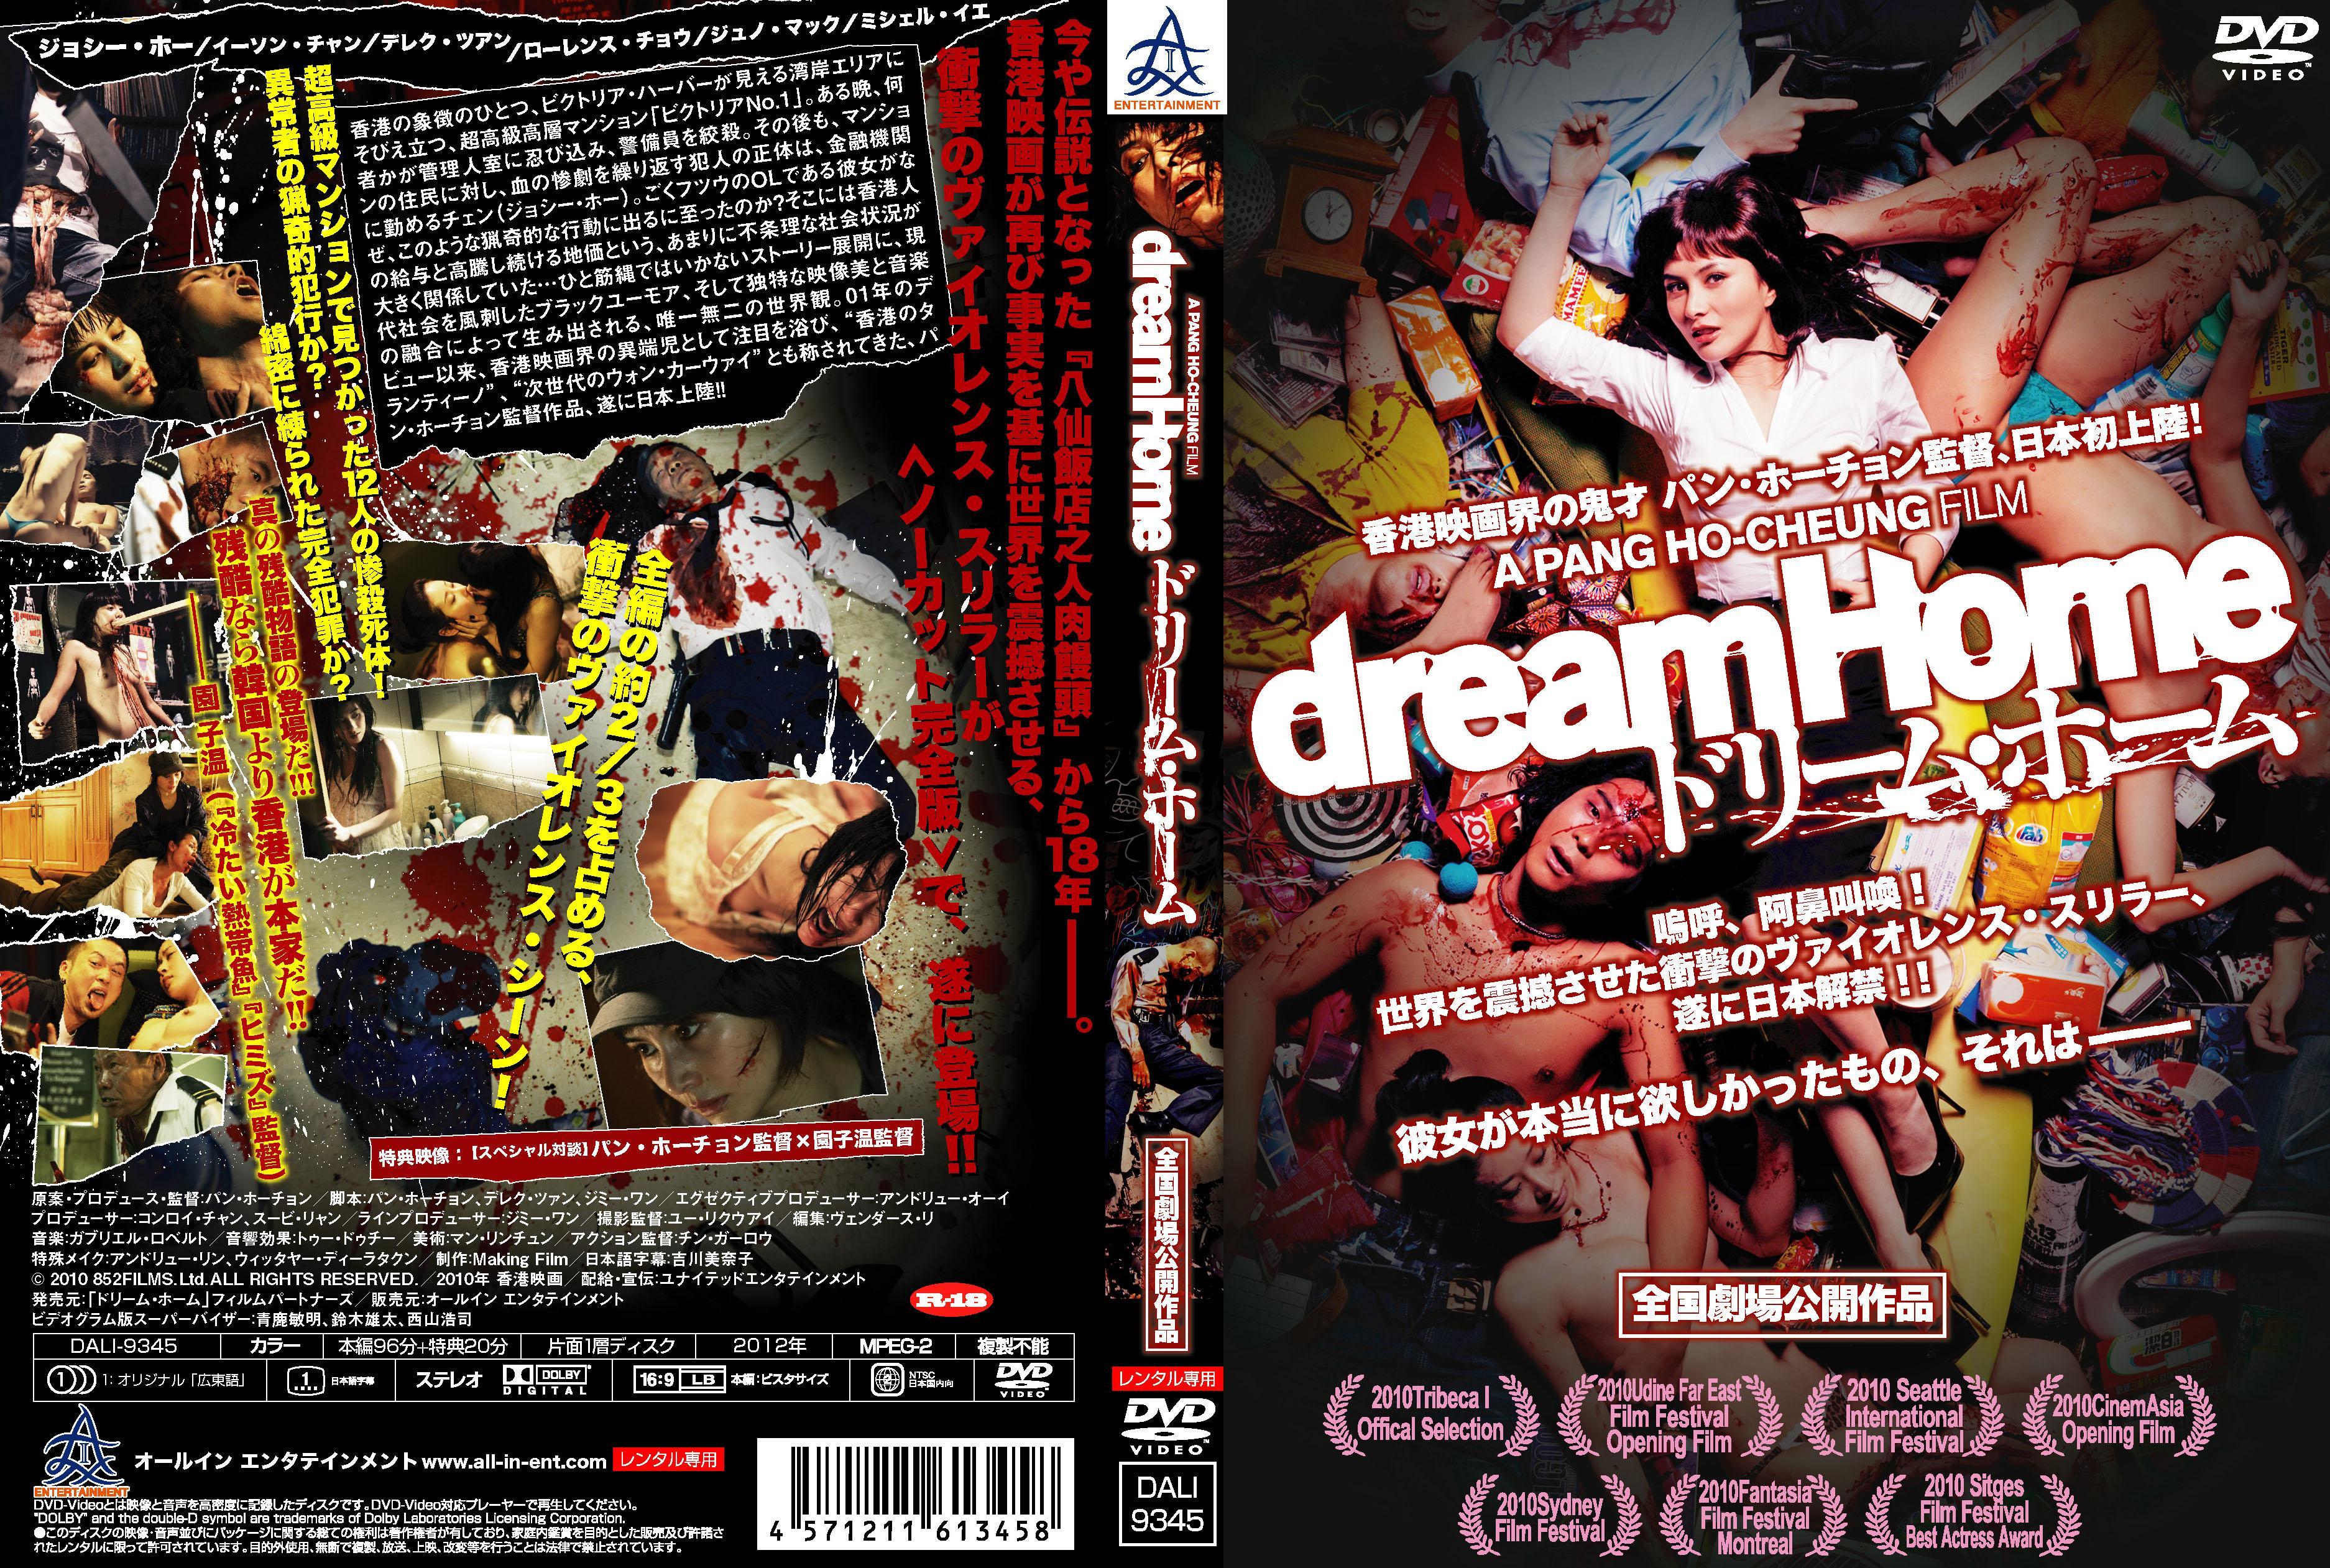 A PANG HO -CHEUNG FILM dreamHome ドリーム・ホーム のサムネイル画像